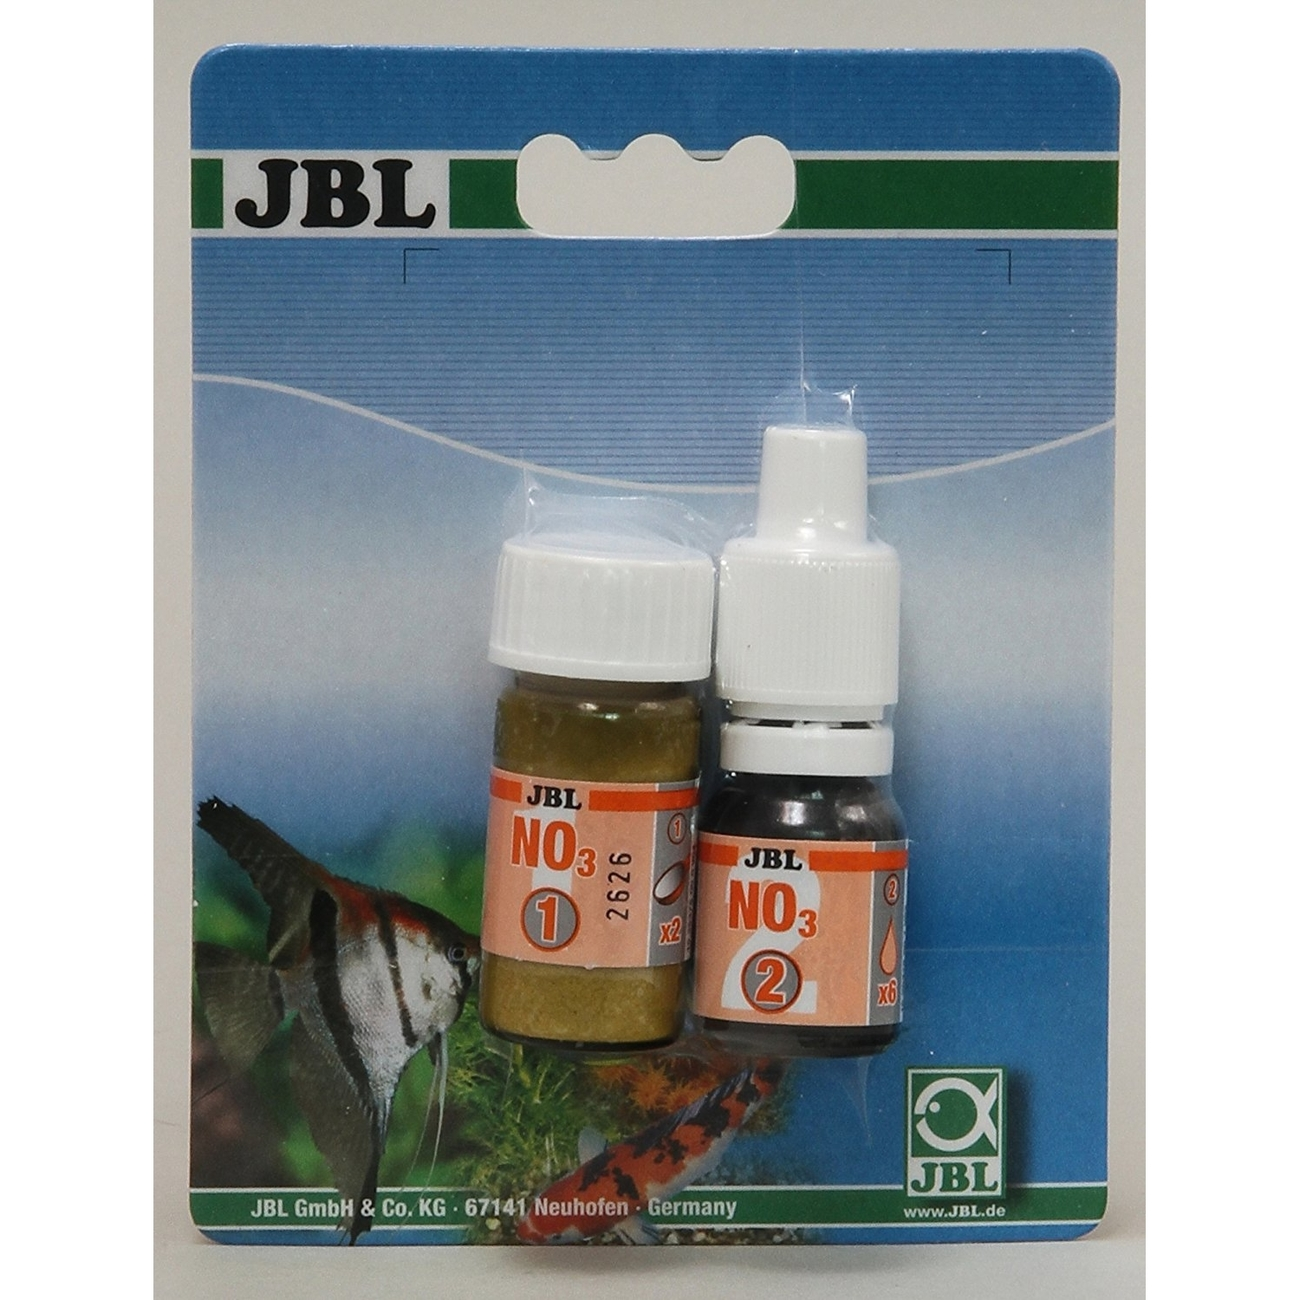 JBL NO3 Nitrat Reagens Nachfüllpack, Nachfüllpack